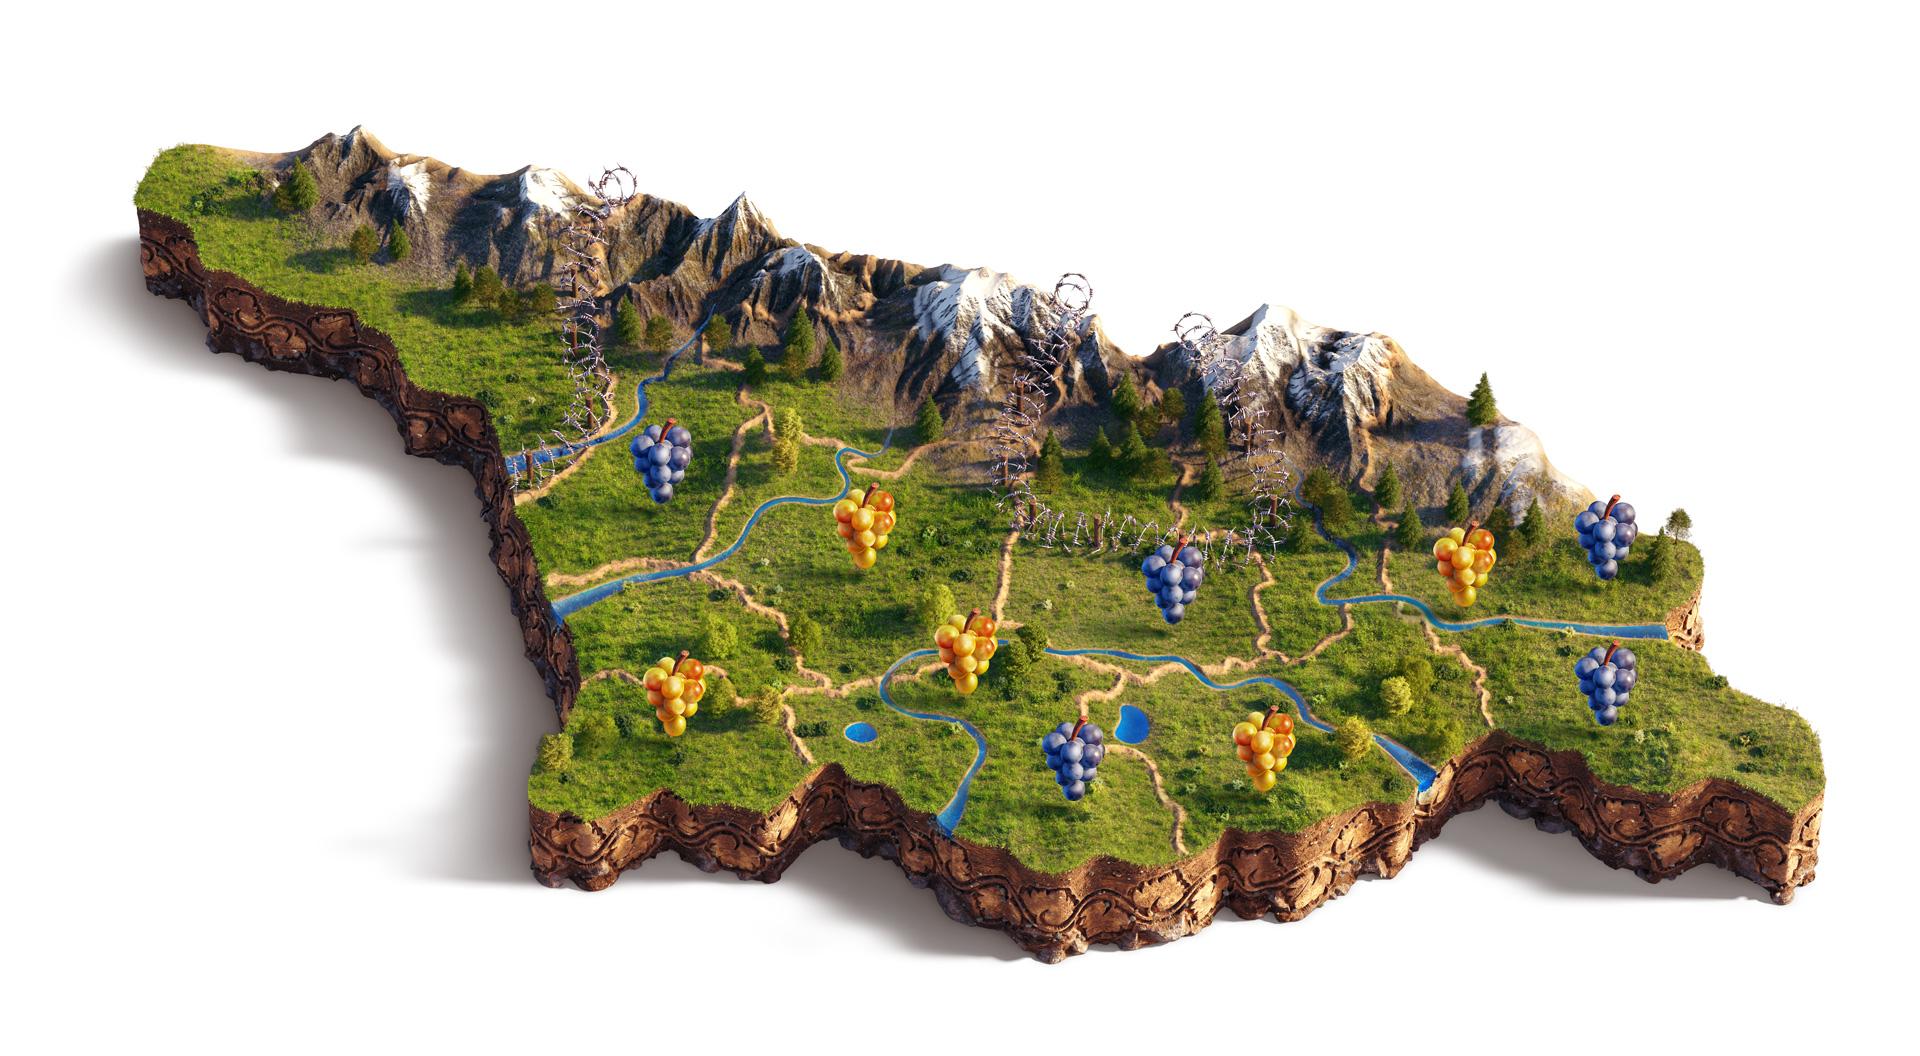 Map-Visual-Pin-w1920-q80-01